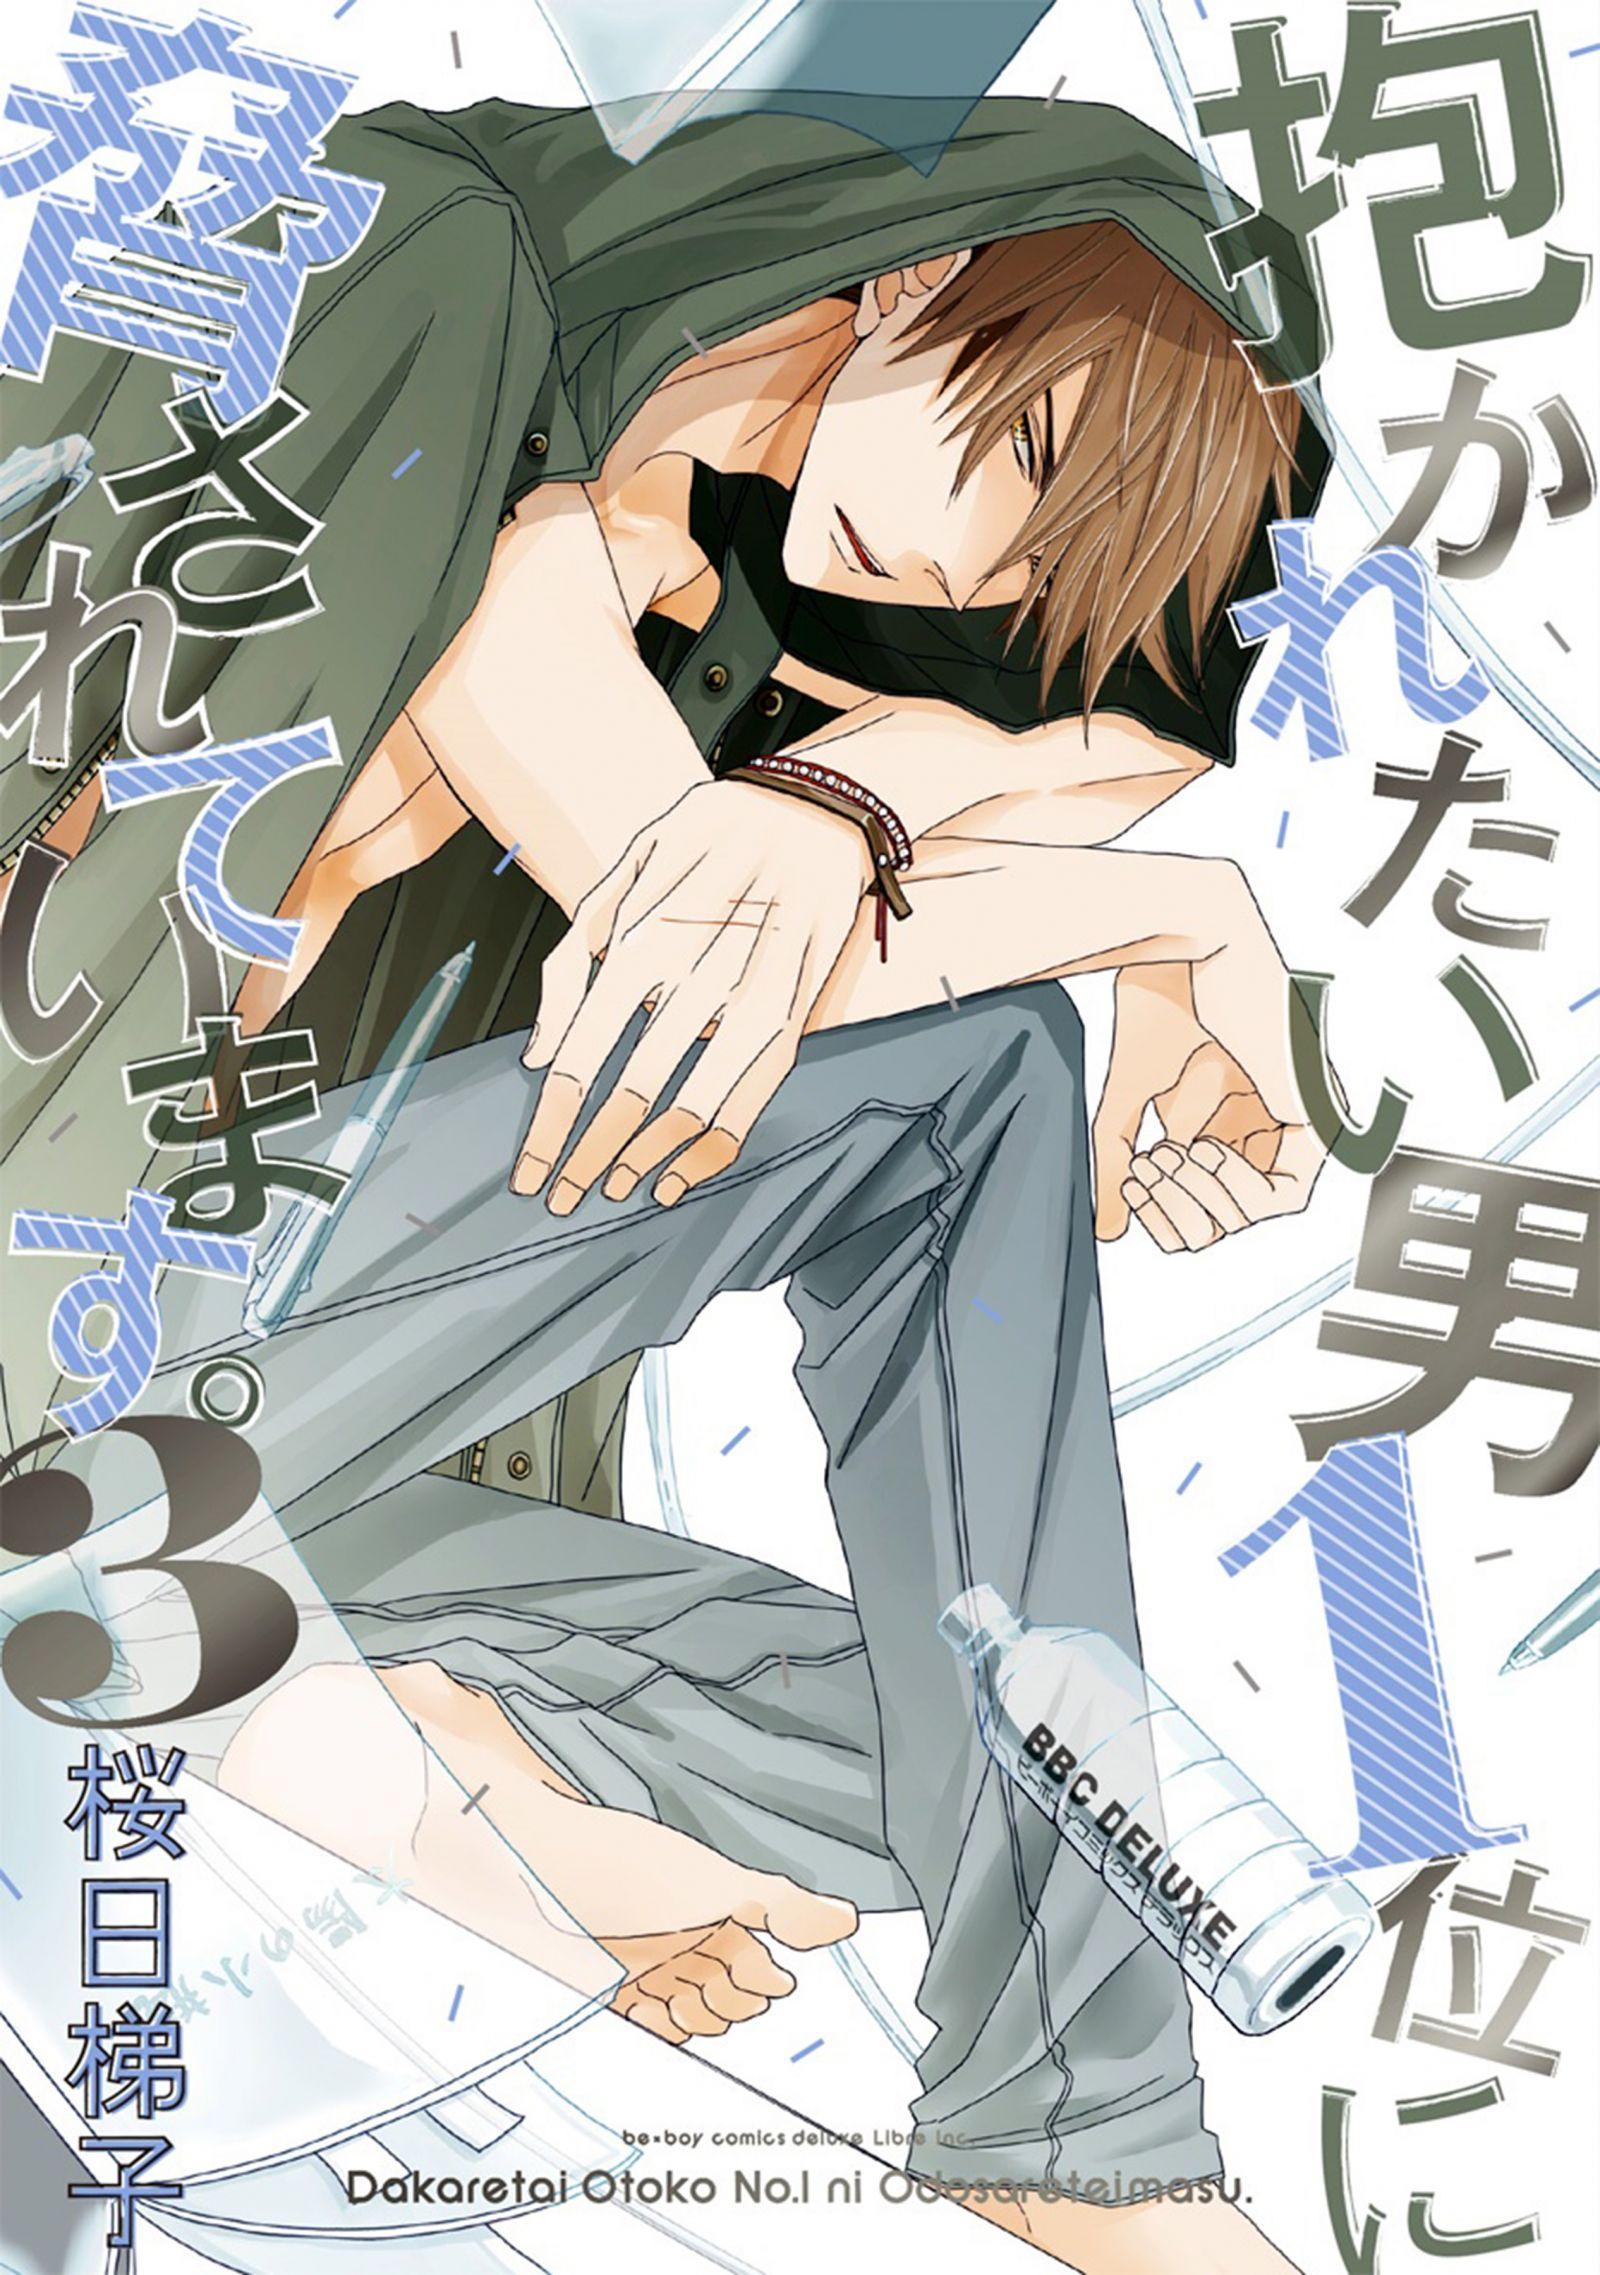 Dakaretai Otoko Ichii Seiyuu Anime Wallpaper